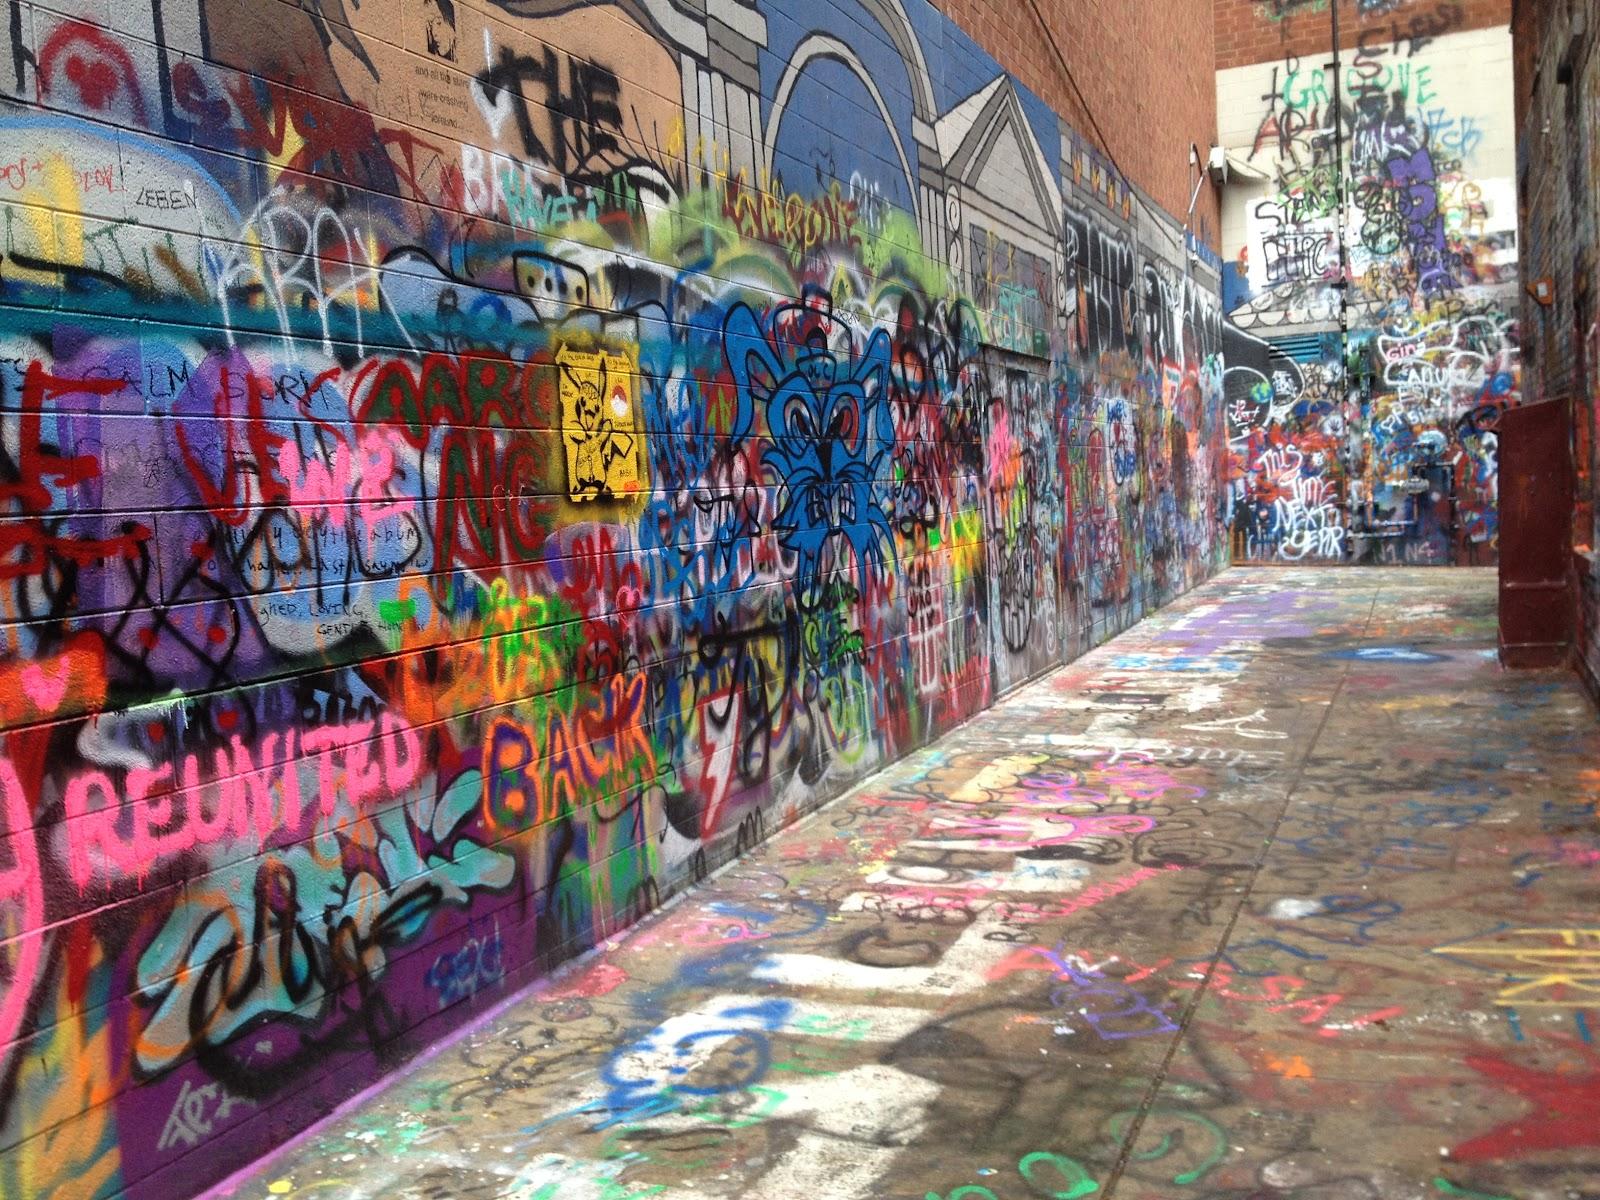 Graffiti wall ann arbor - Ann Arbor Alleyway Full Of Cool Graffiti